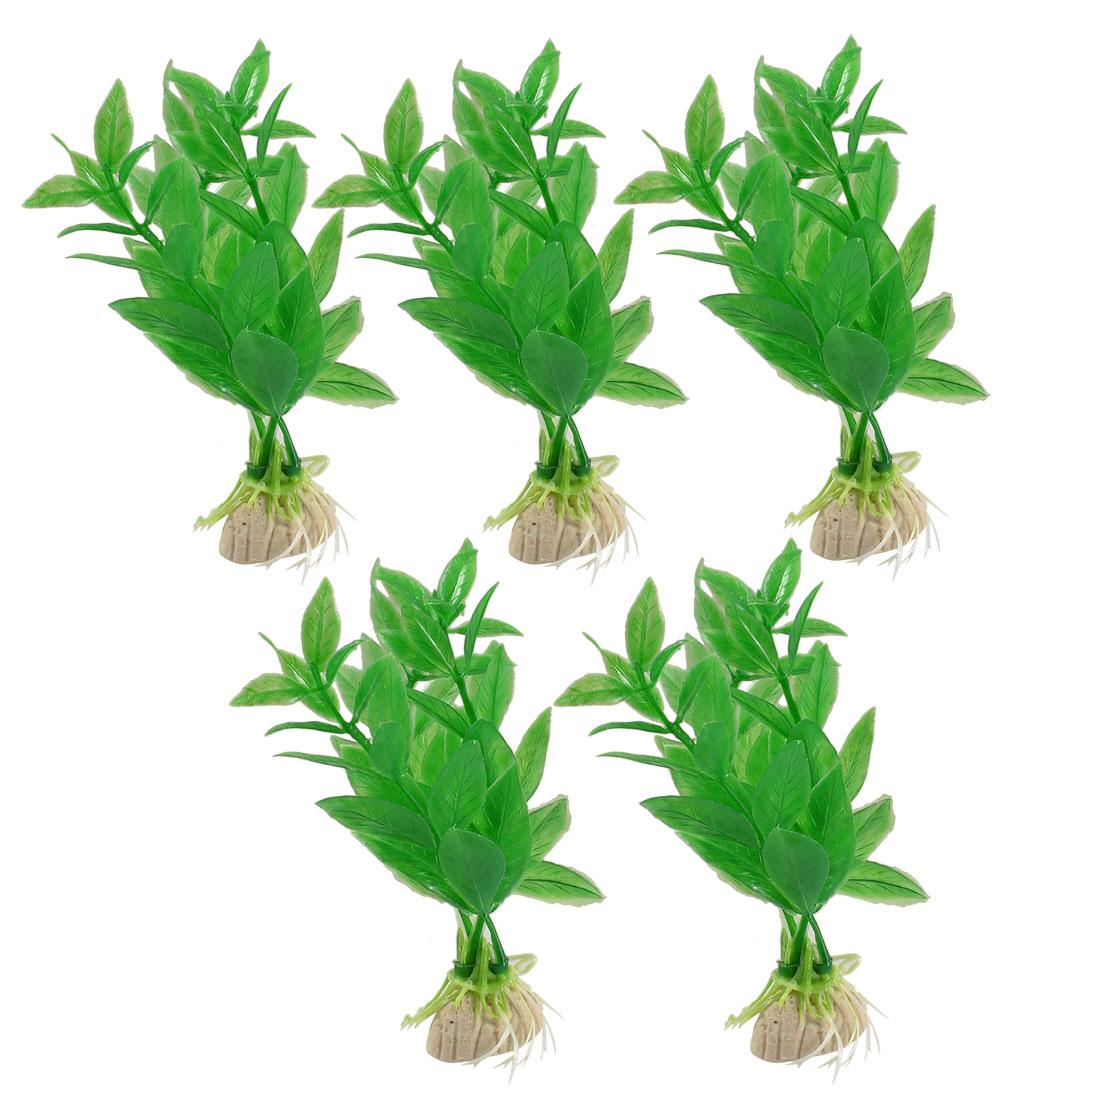 5 Pcs Ceramic Base Lifelike Green Plastic Plants Grass Plants Decoration